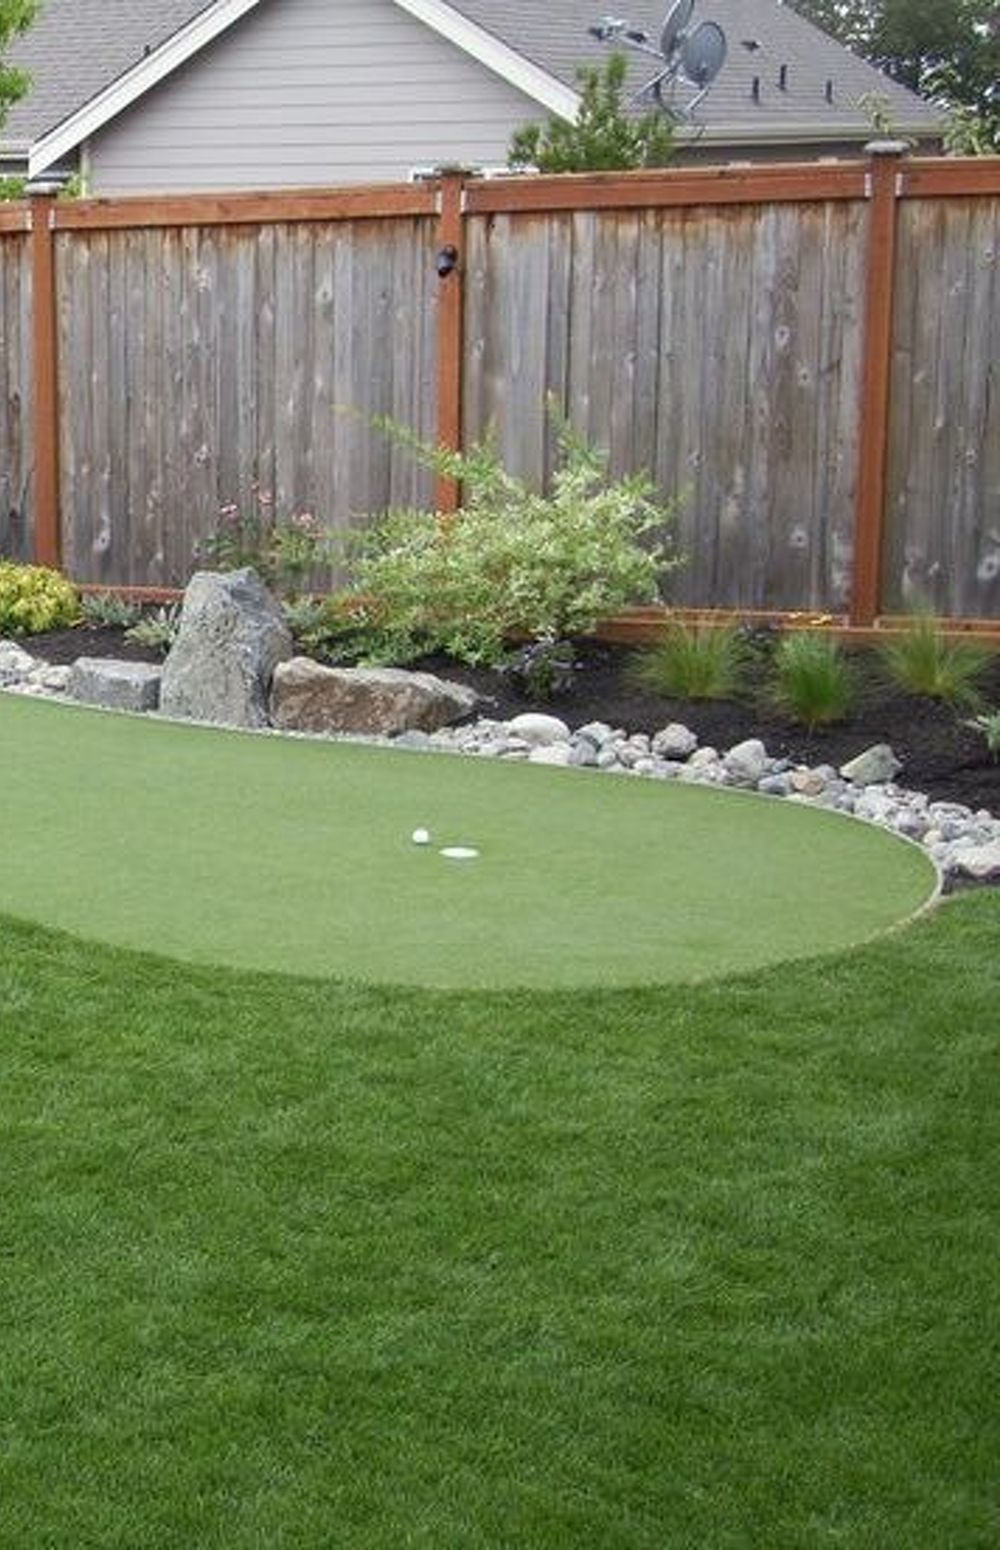 backyard putting greens | Found on syntheticturfnort ... on Putting Green Ideas For Backyard id=93320